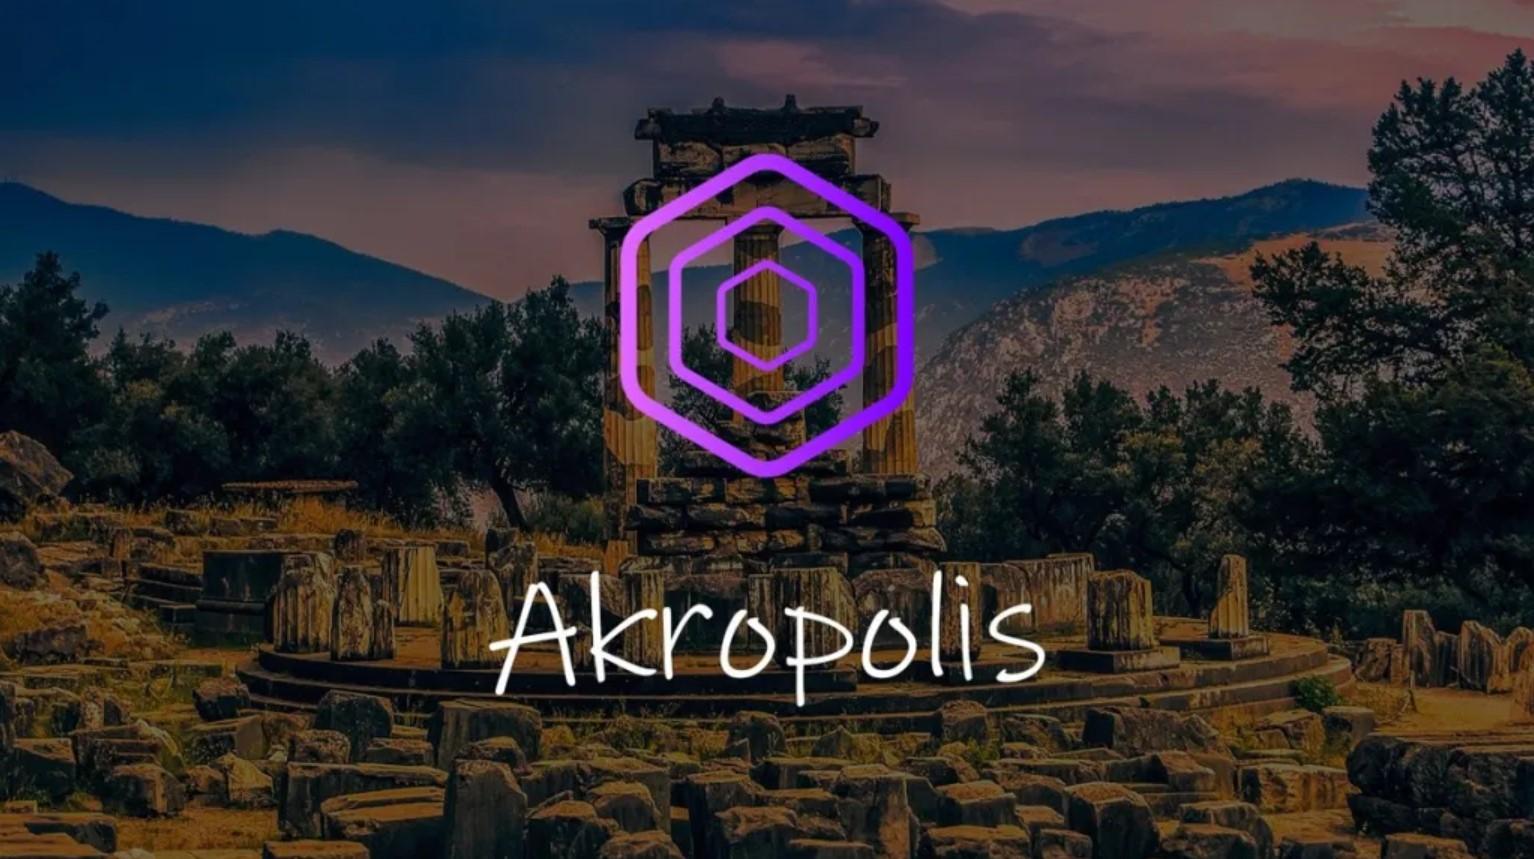 E8C18494 73B3 4756 818A CFDA13B03D77 - معرفی بنیانگذار Akropolis